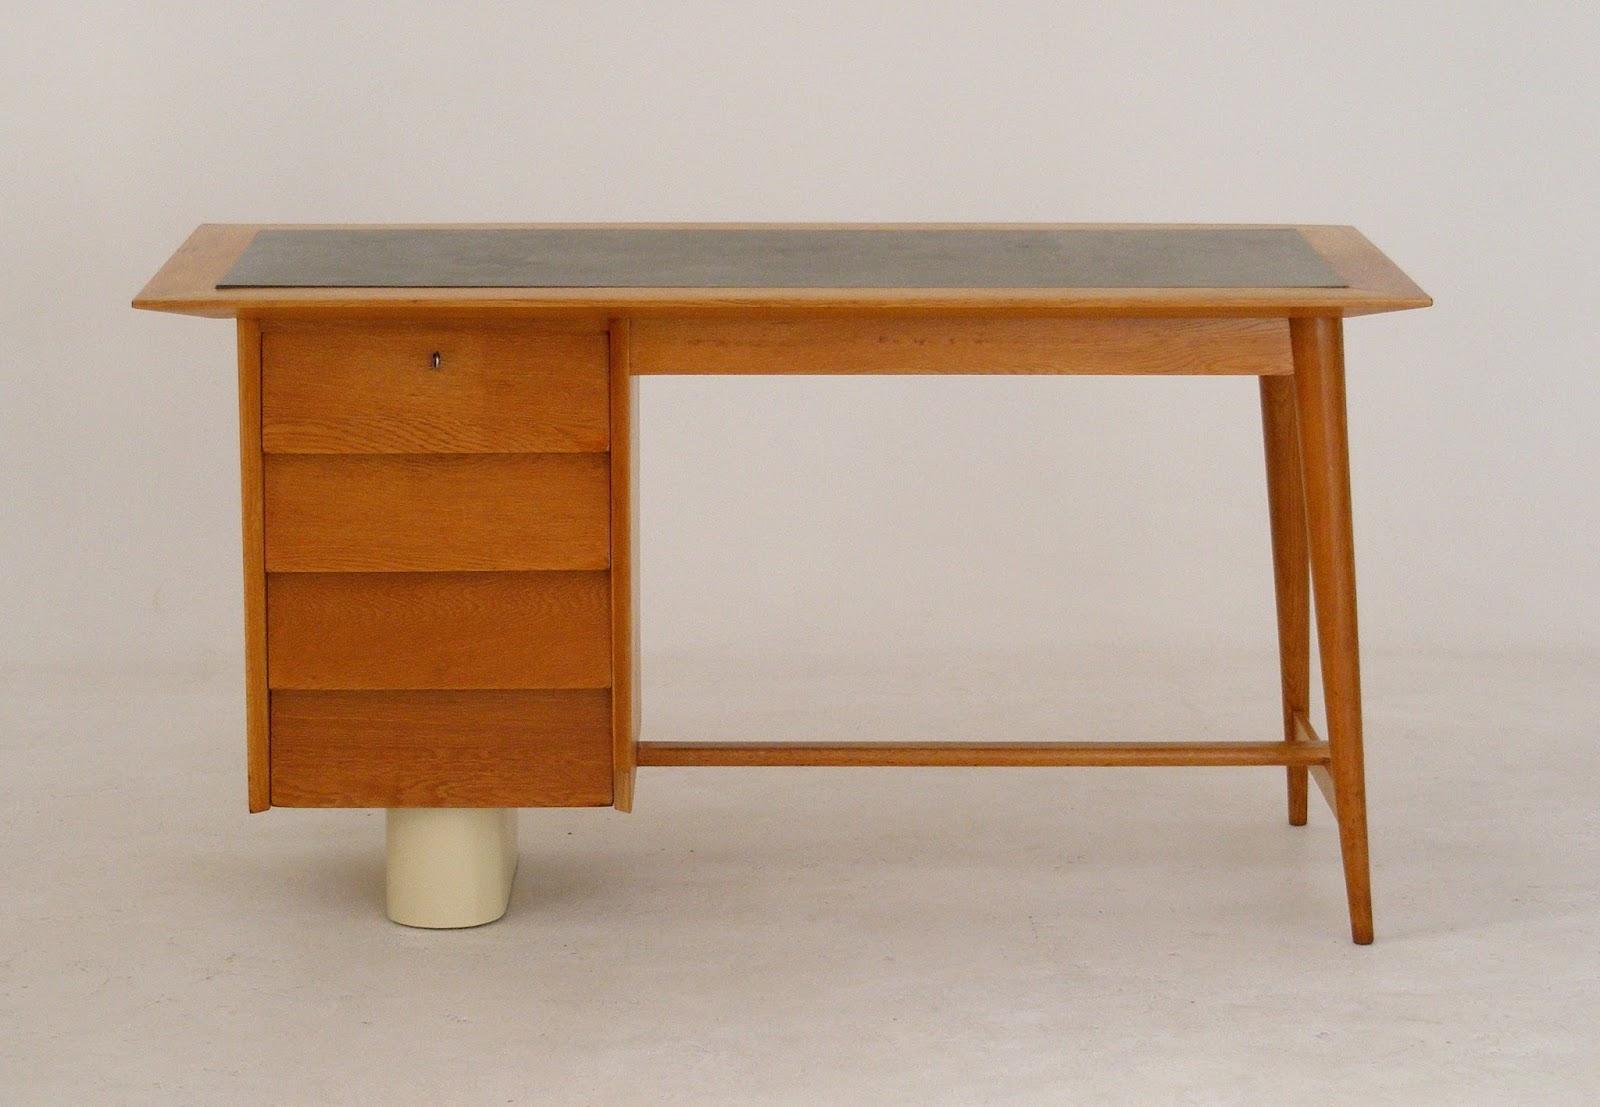 VAMP FURNITURE This weeks new vintage furniture stock at  : PIC2B3BVAMPOAK2BDESK08042016 from vampfurniture.blogspot.co.za size 1600 x 1107 jpeg 203kB